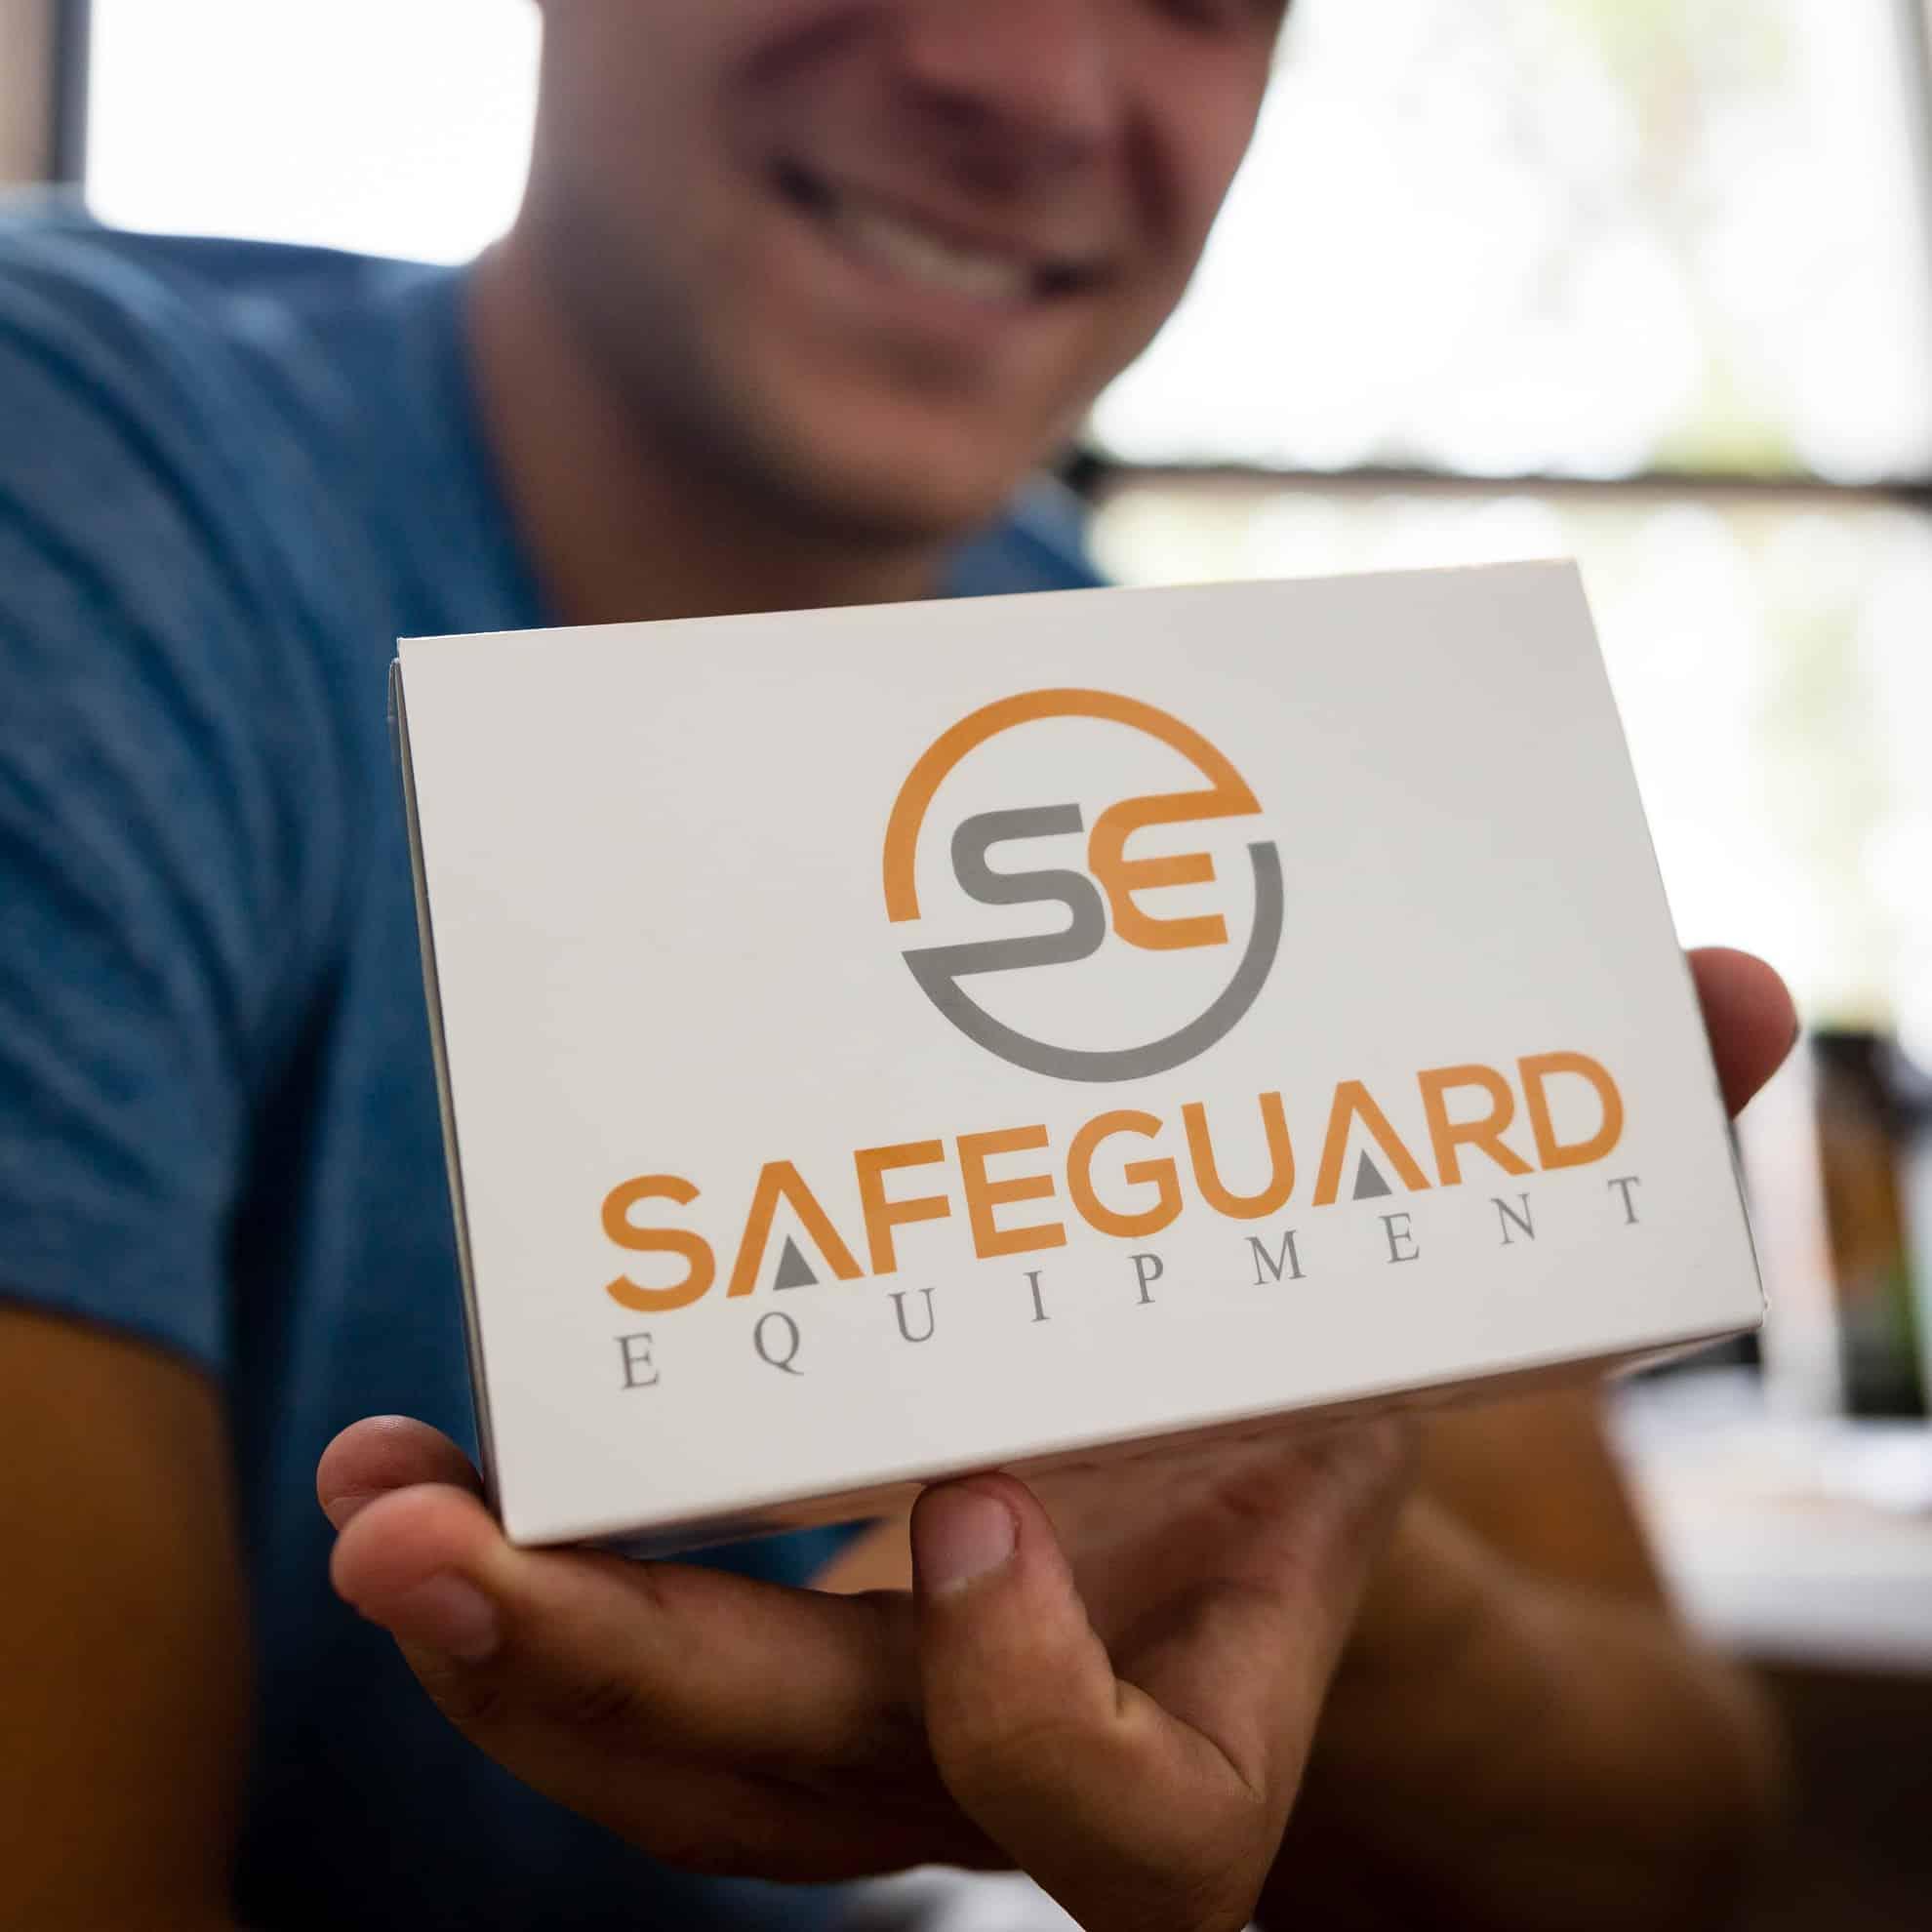 Brandon Bledsoe with Safeguard Equipment